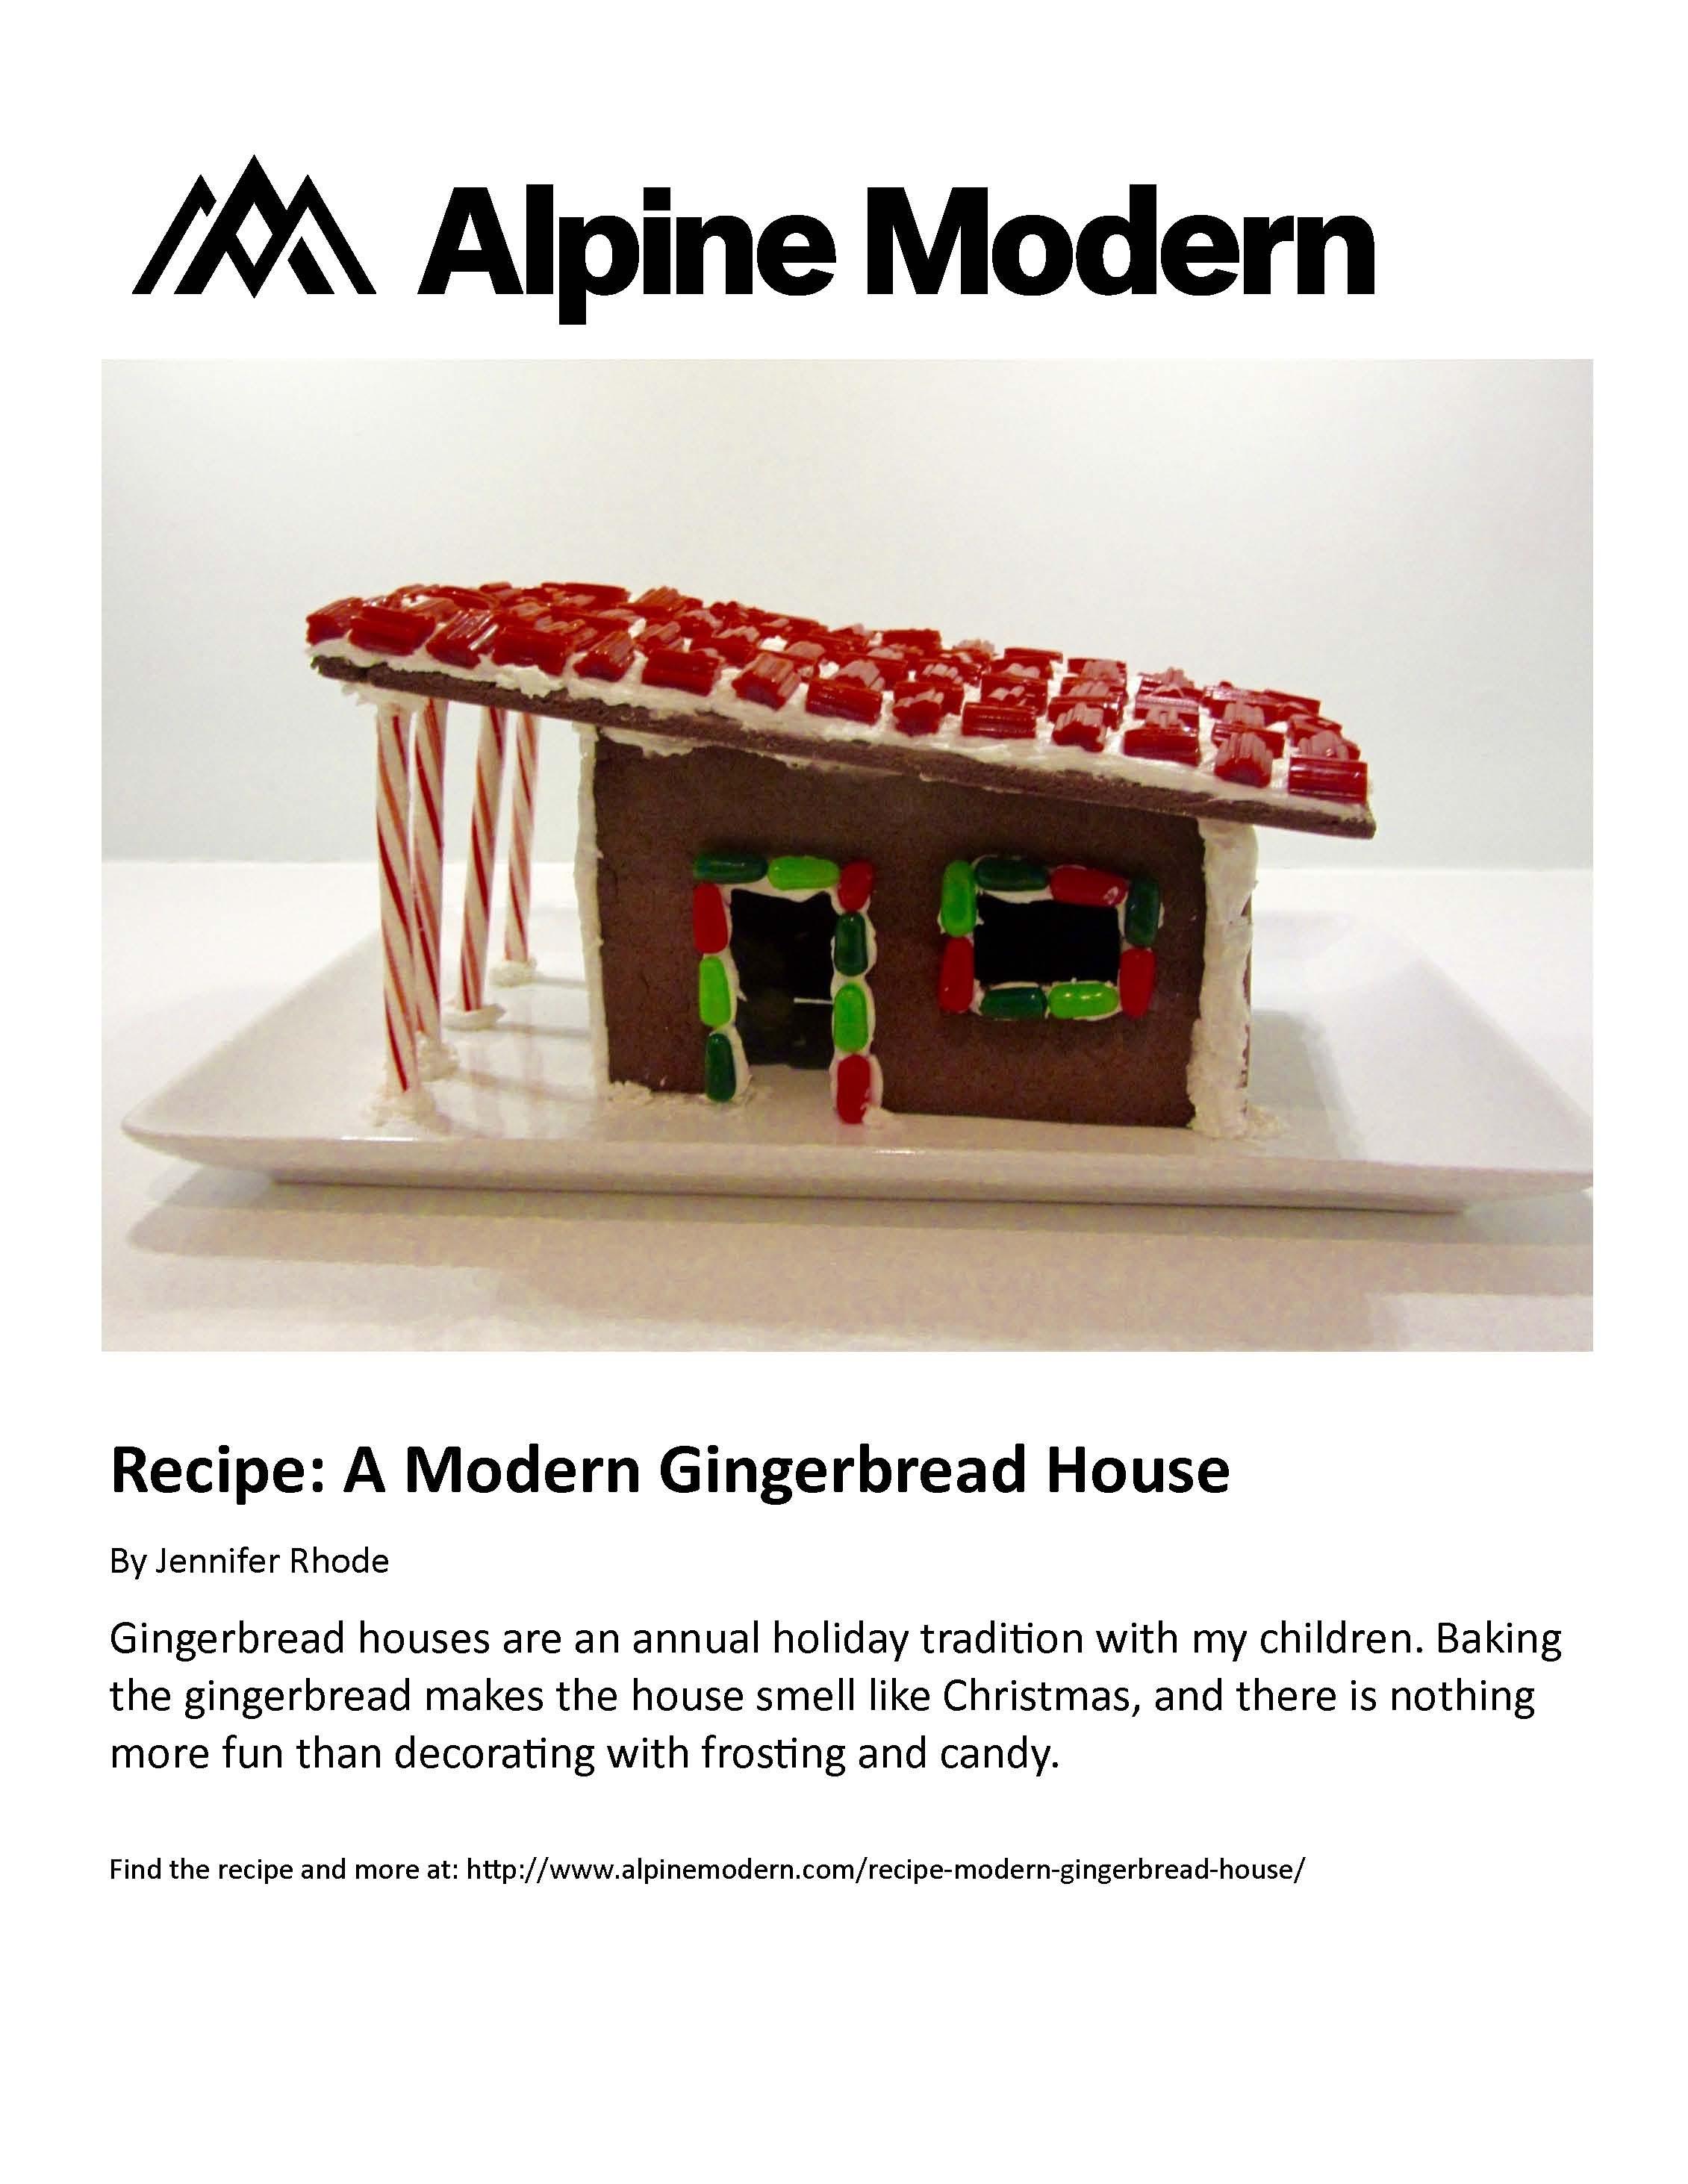 Modern Gingerbread House 02-08-17.jpg